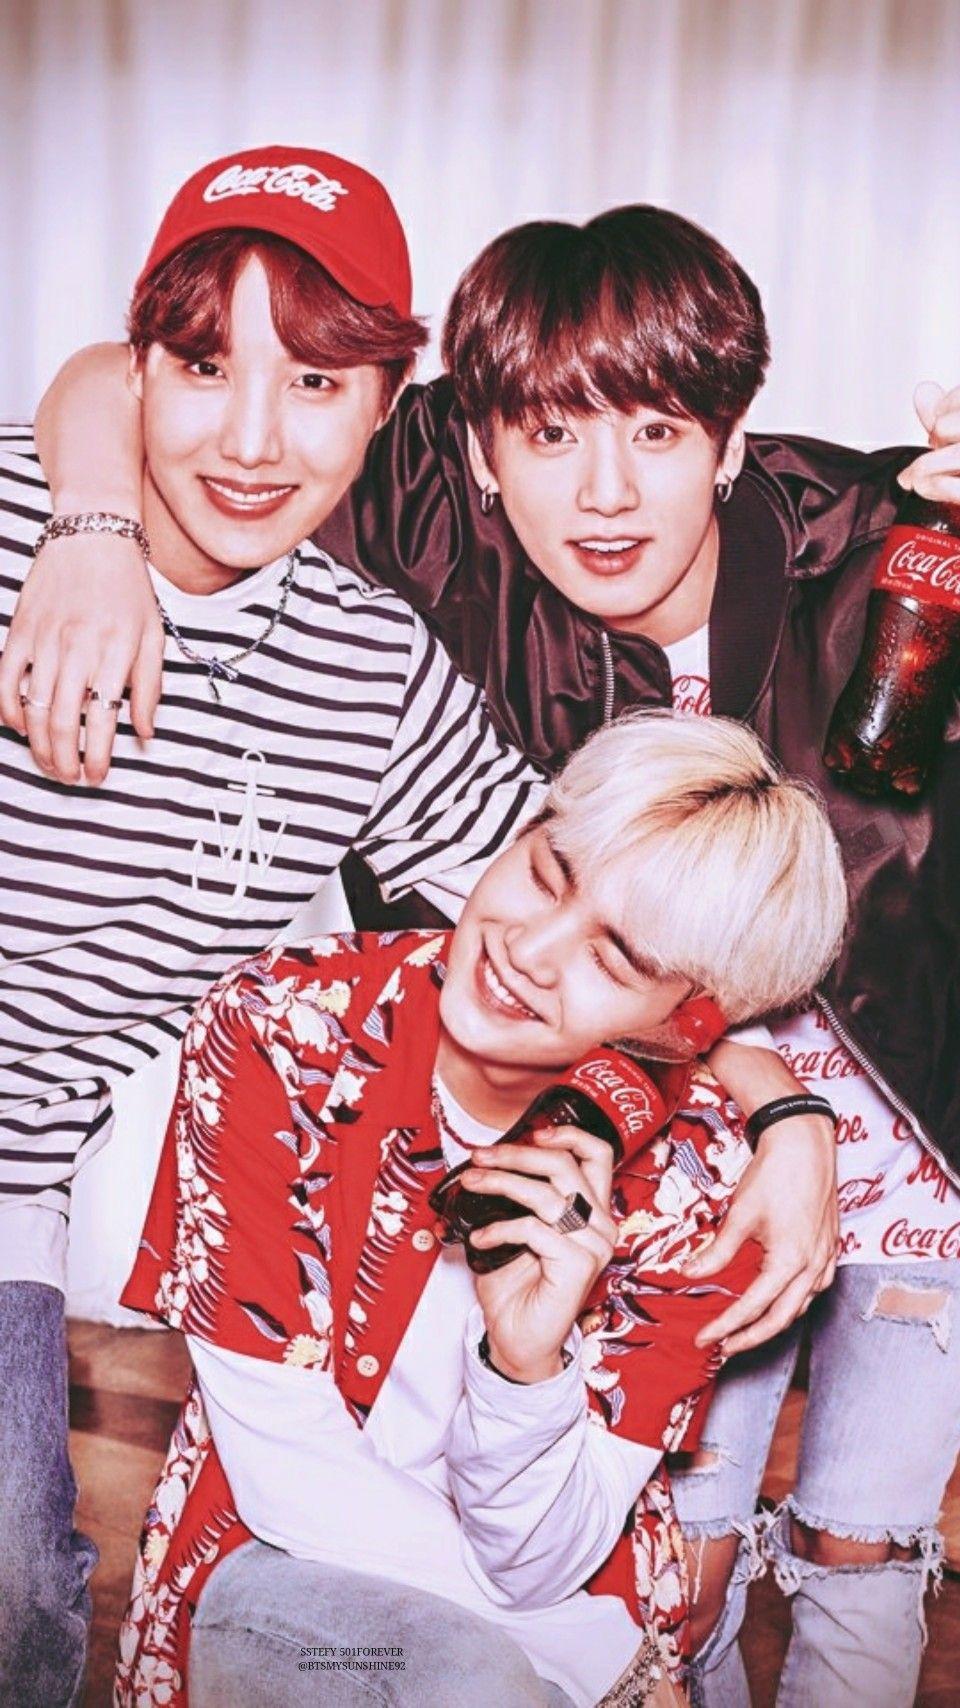 Jhope Jungkook Suga Bts X Coca Cola Lockscreen Wallpapers